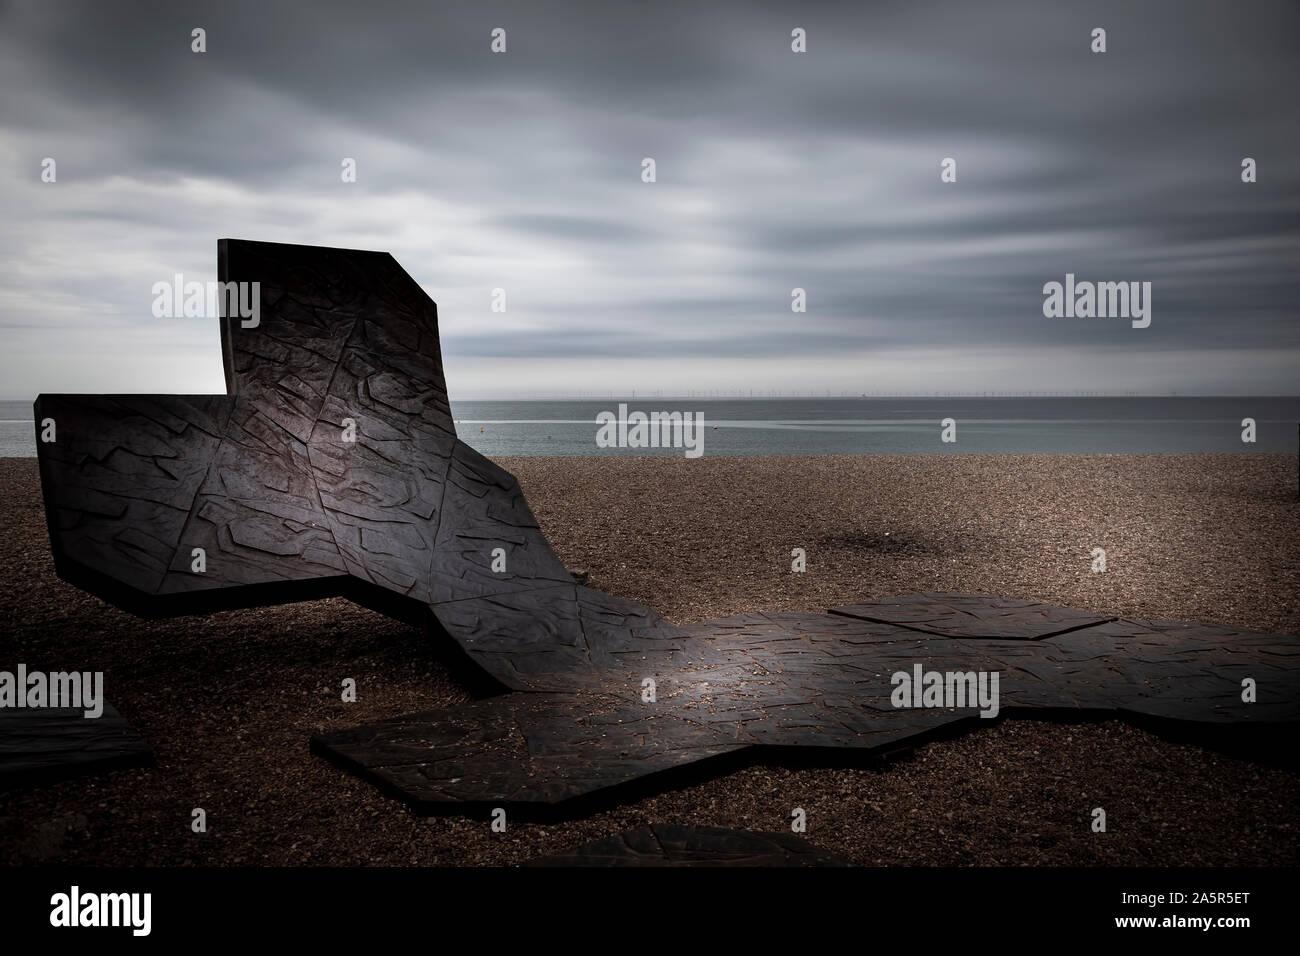 metal sculpture on brighton beach Stock Photo